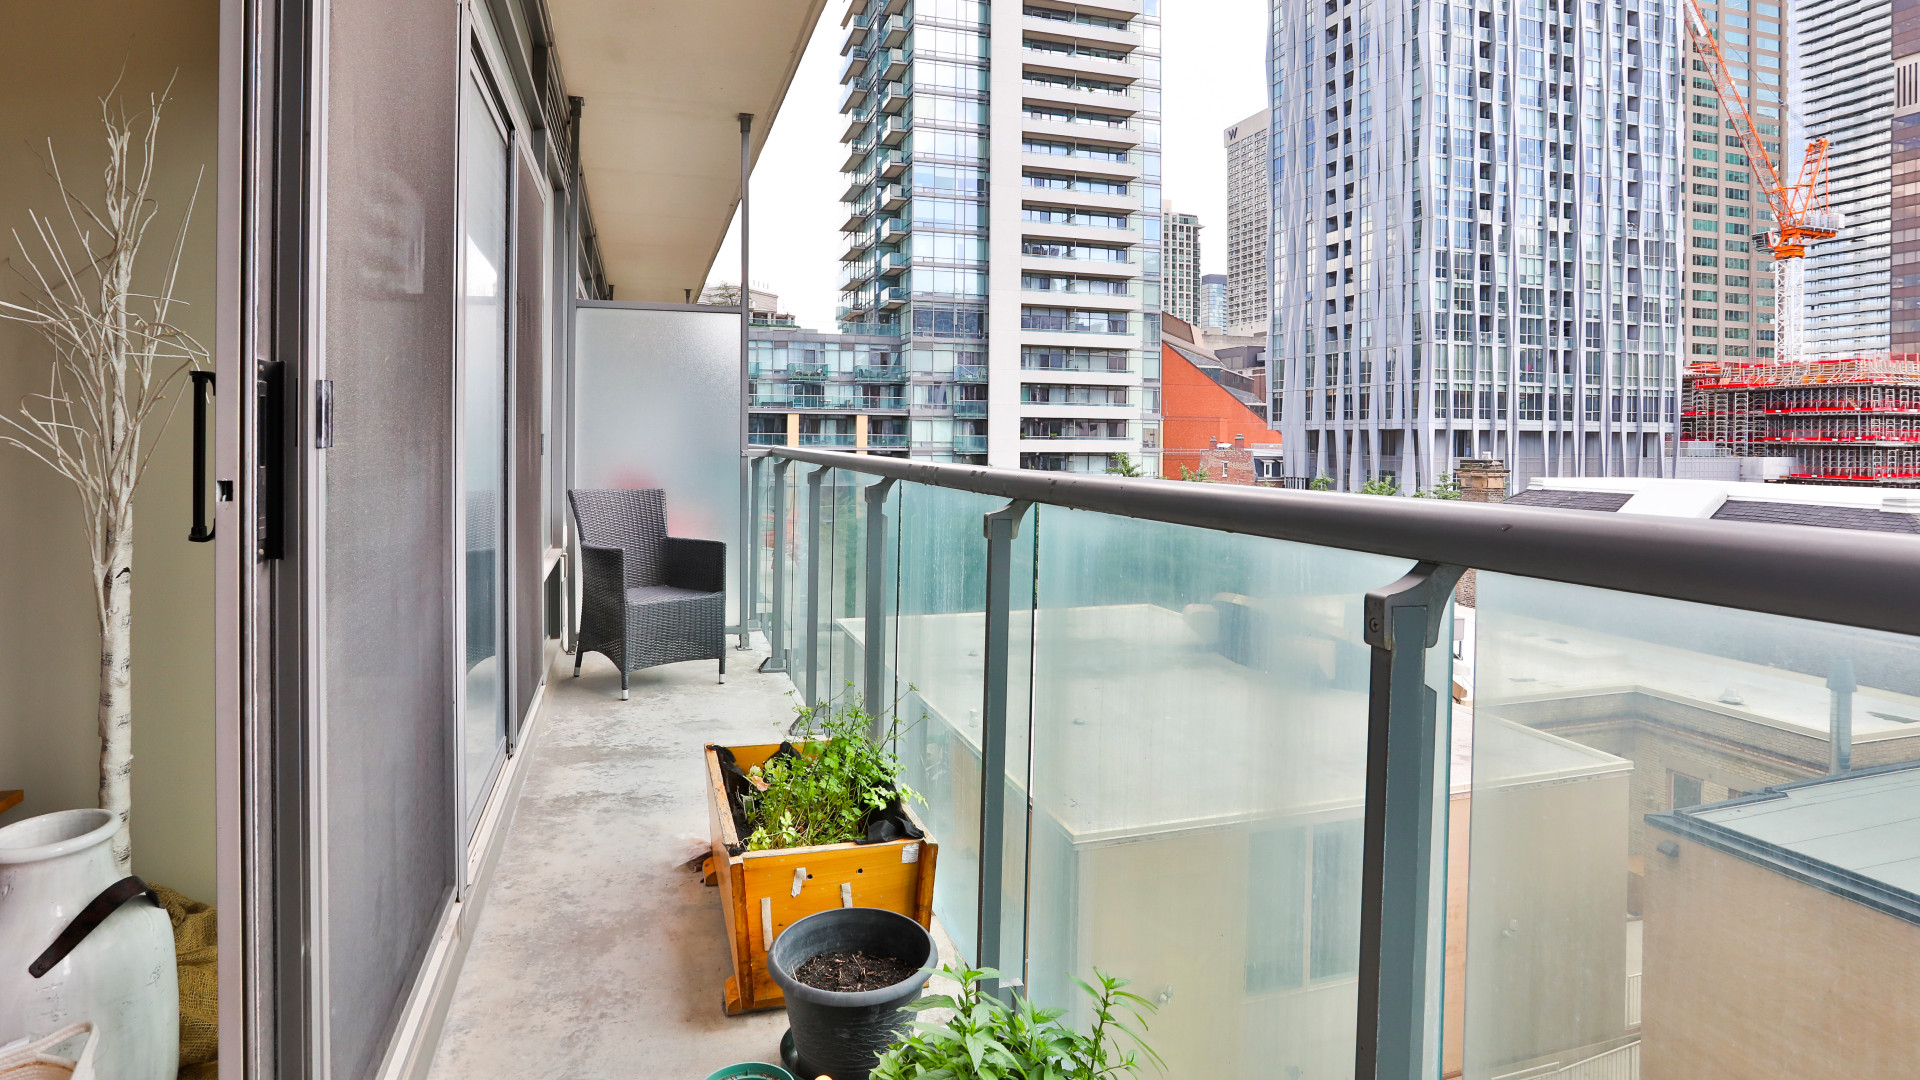 A photo of the balcony